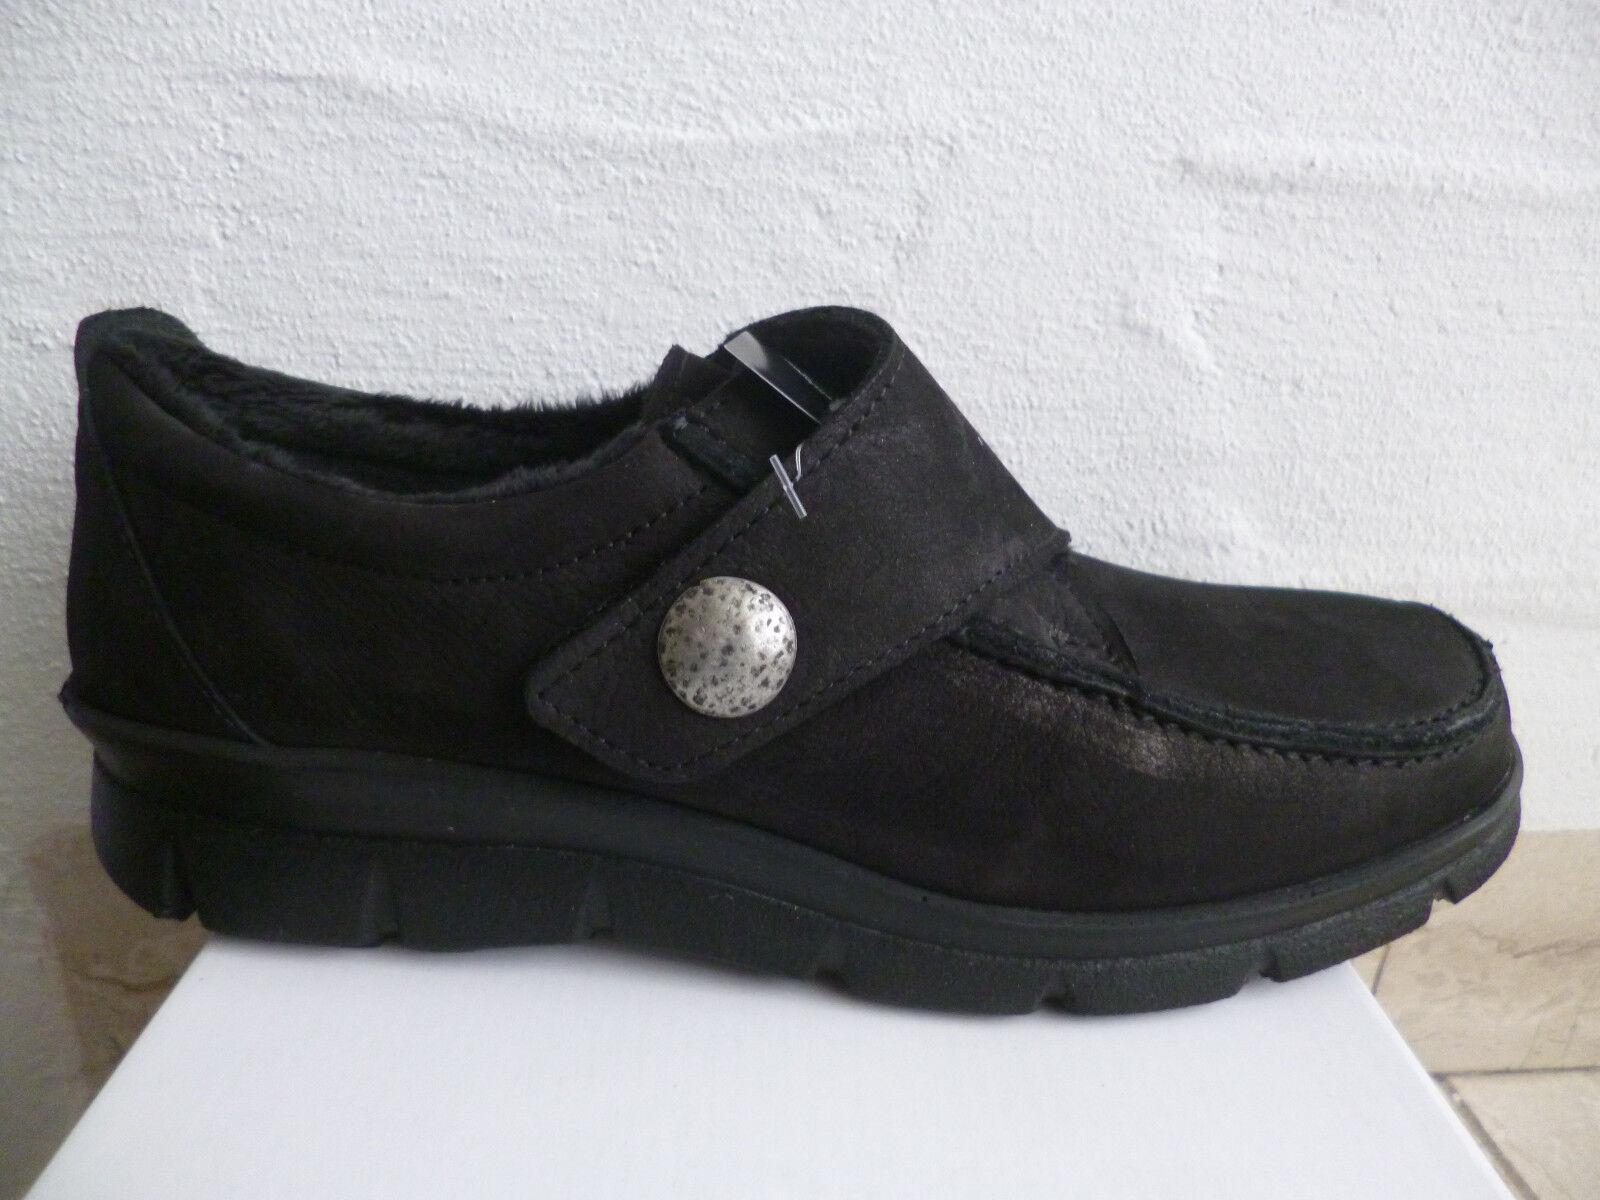 Frankenschuhe Damen Slipper  Halbschuhe, Sneakers, schwarz Leder  Slipper NEU b7a643